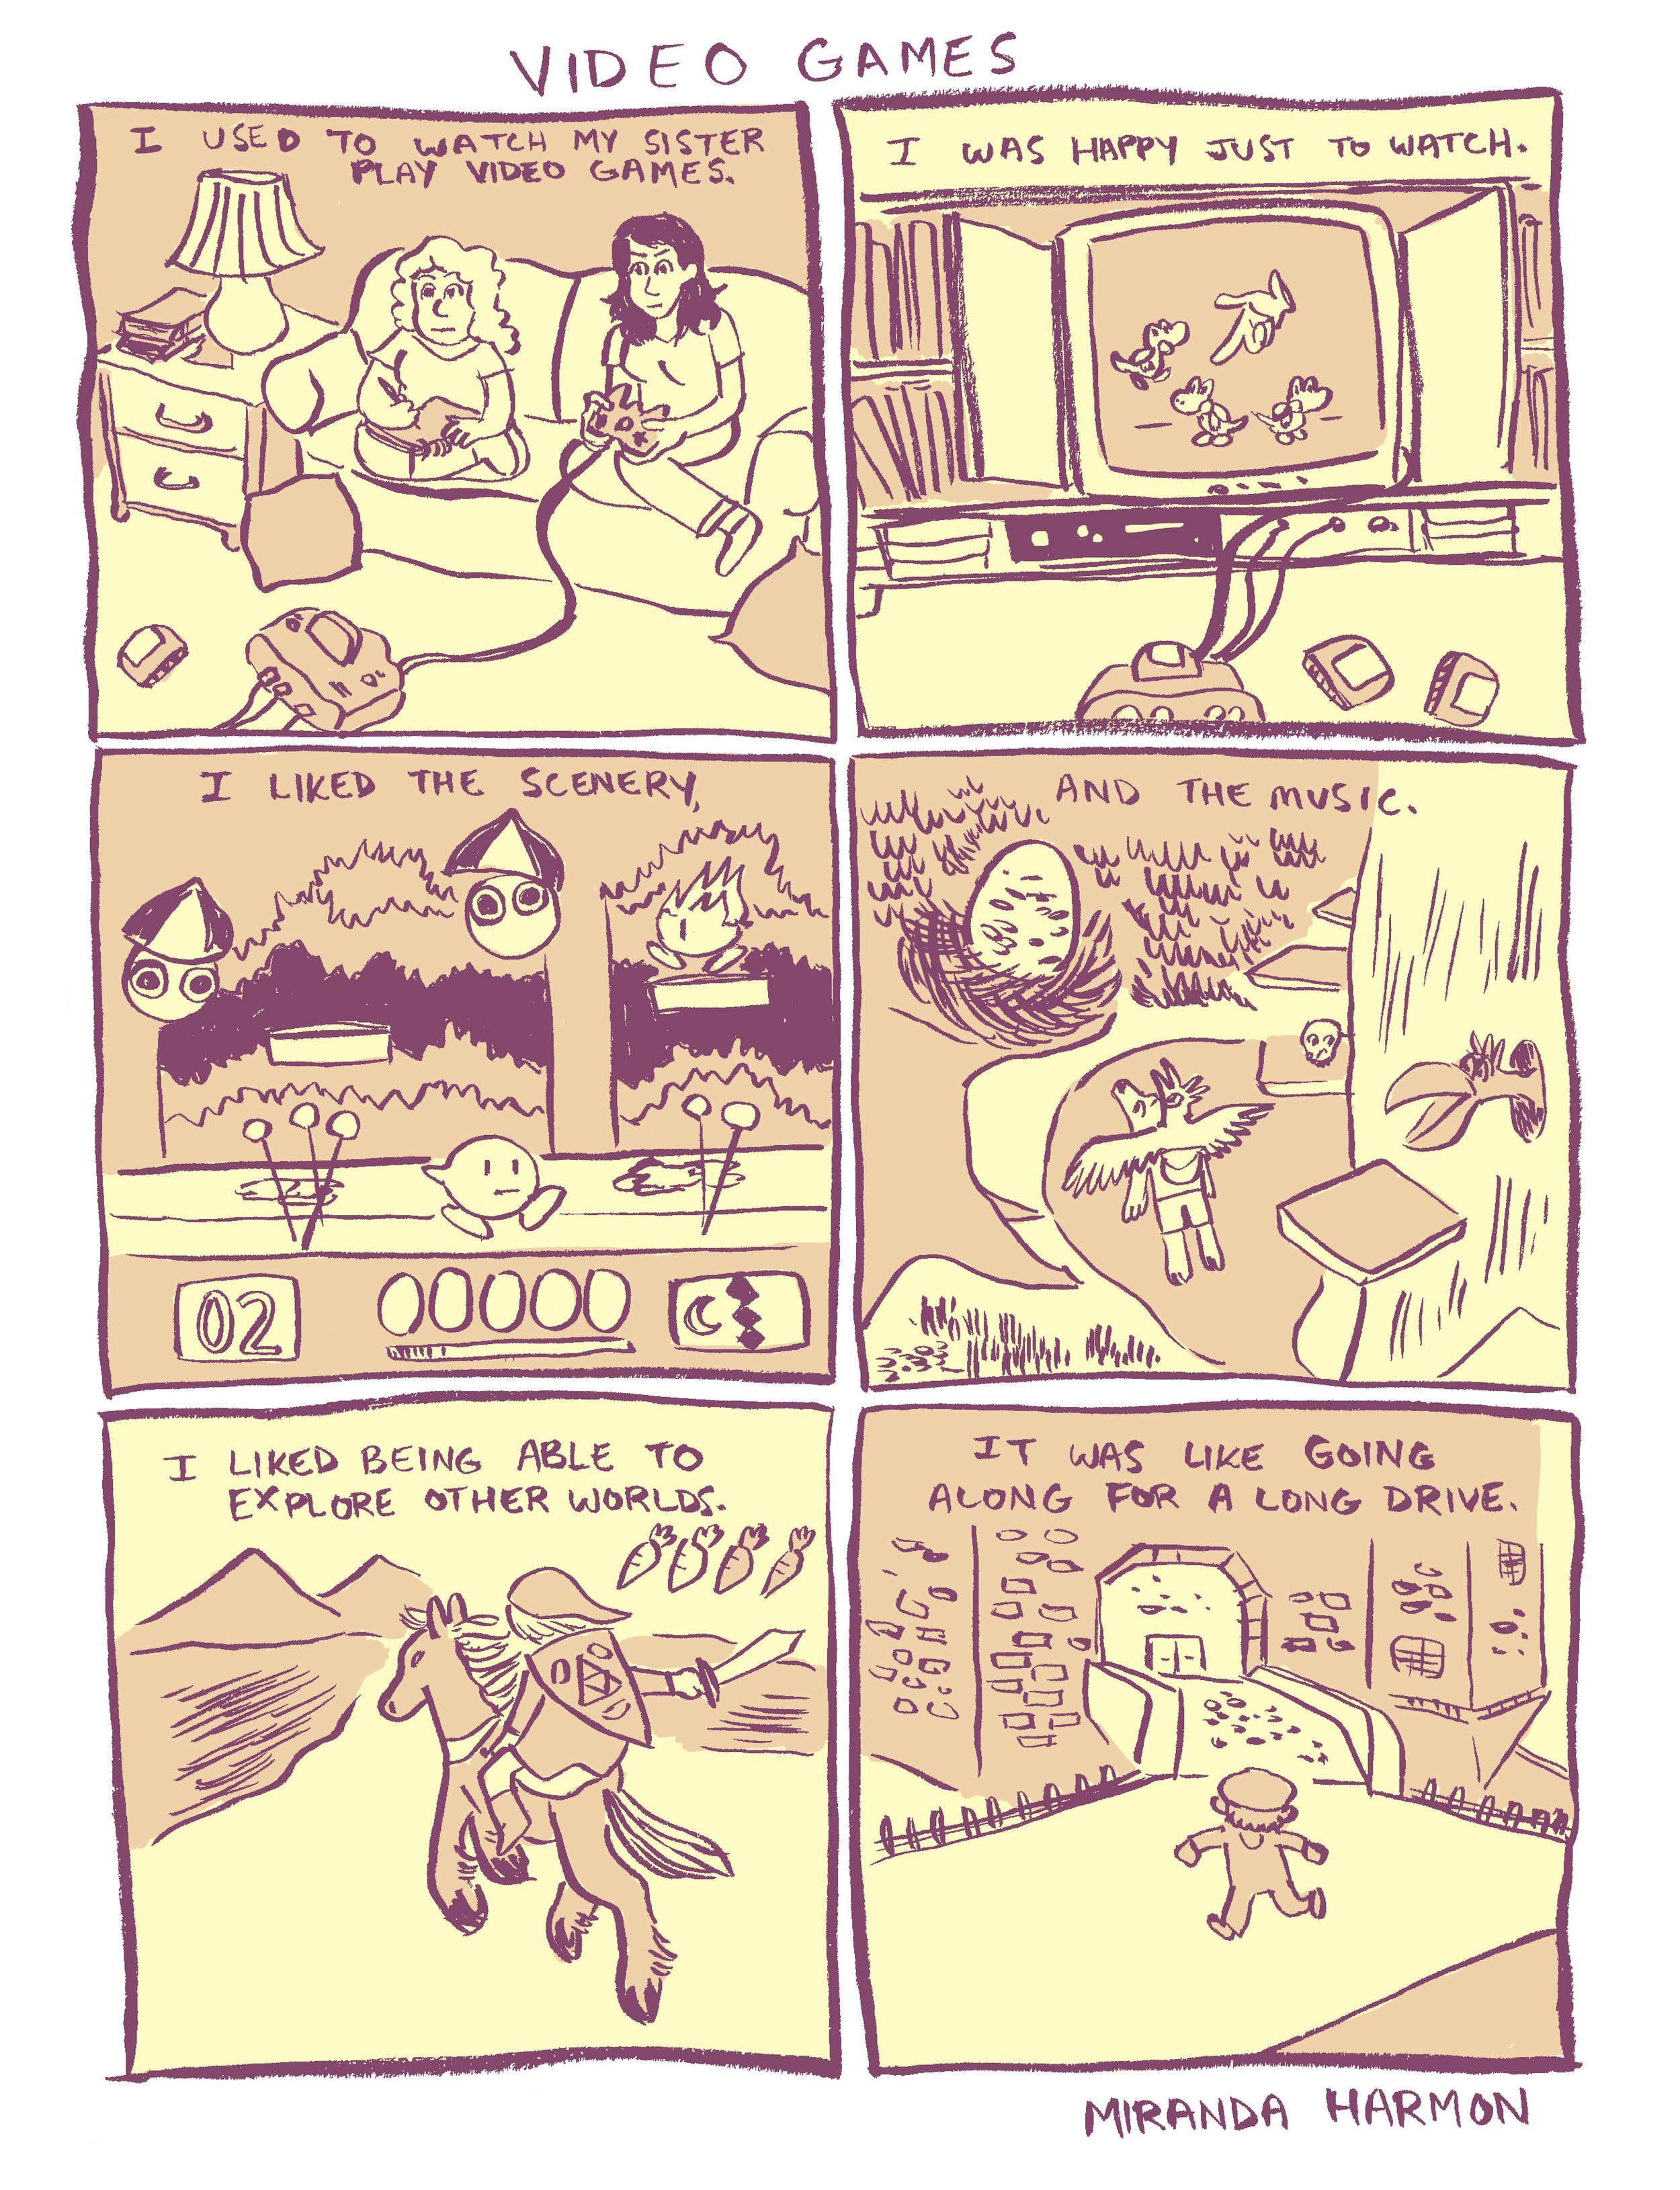 videogames-comic-flat.jpg